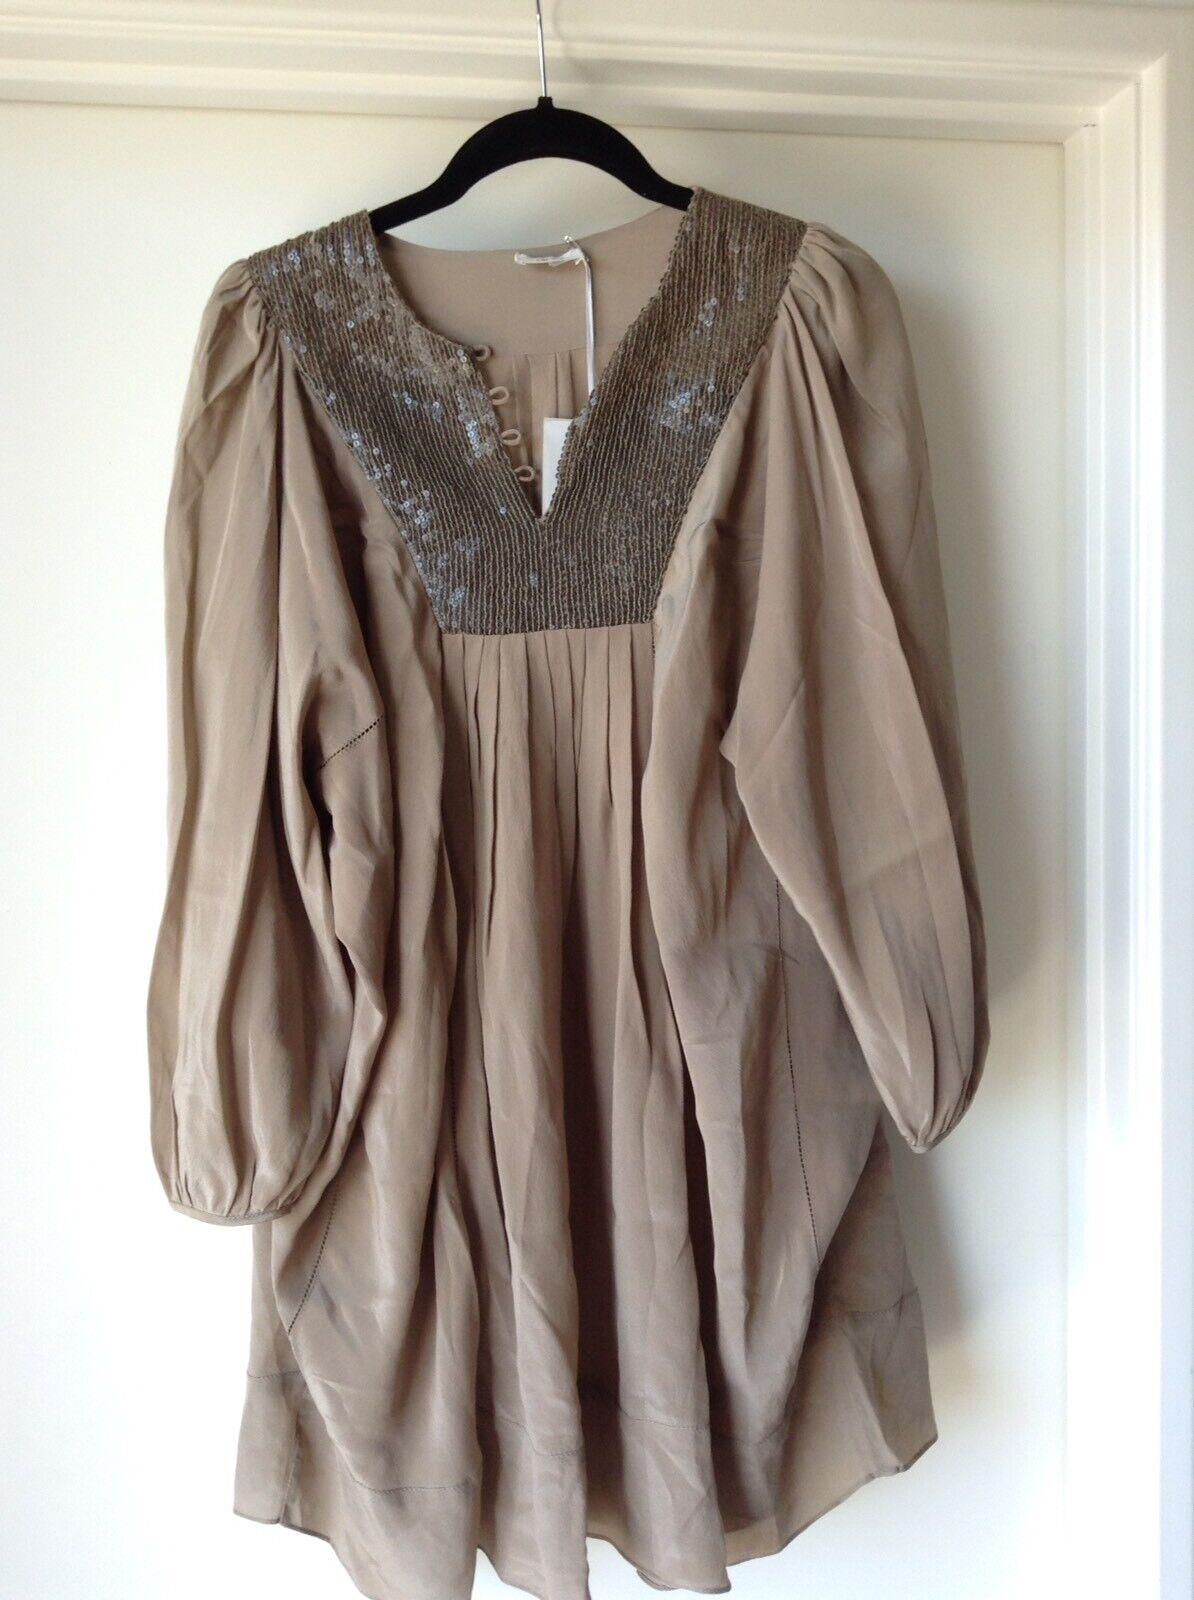 ANU - Mocha Sequinned Silk Tunic Top Dress - One Size